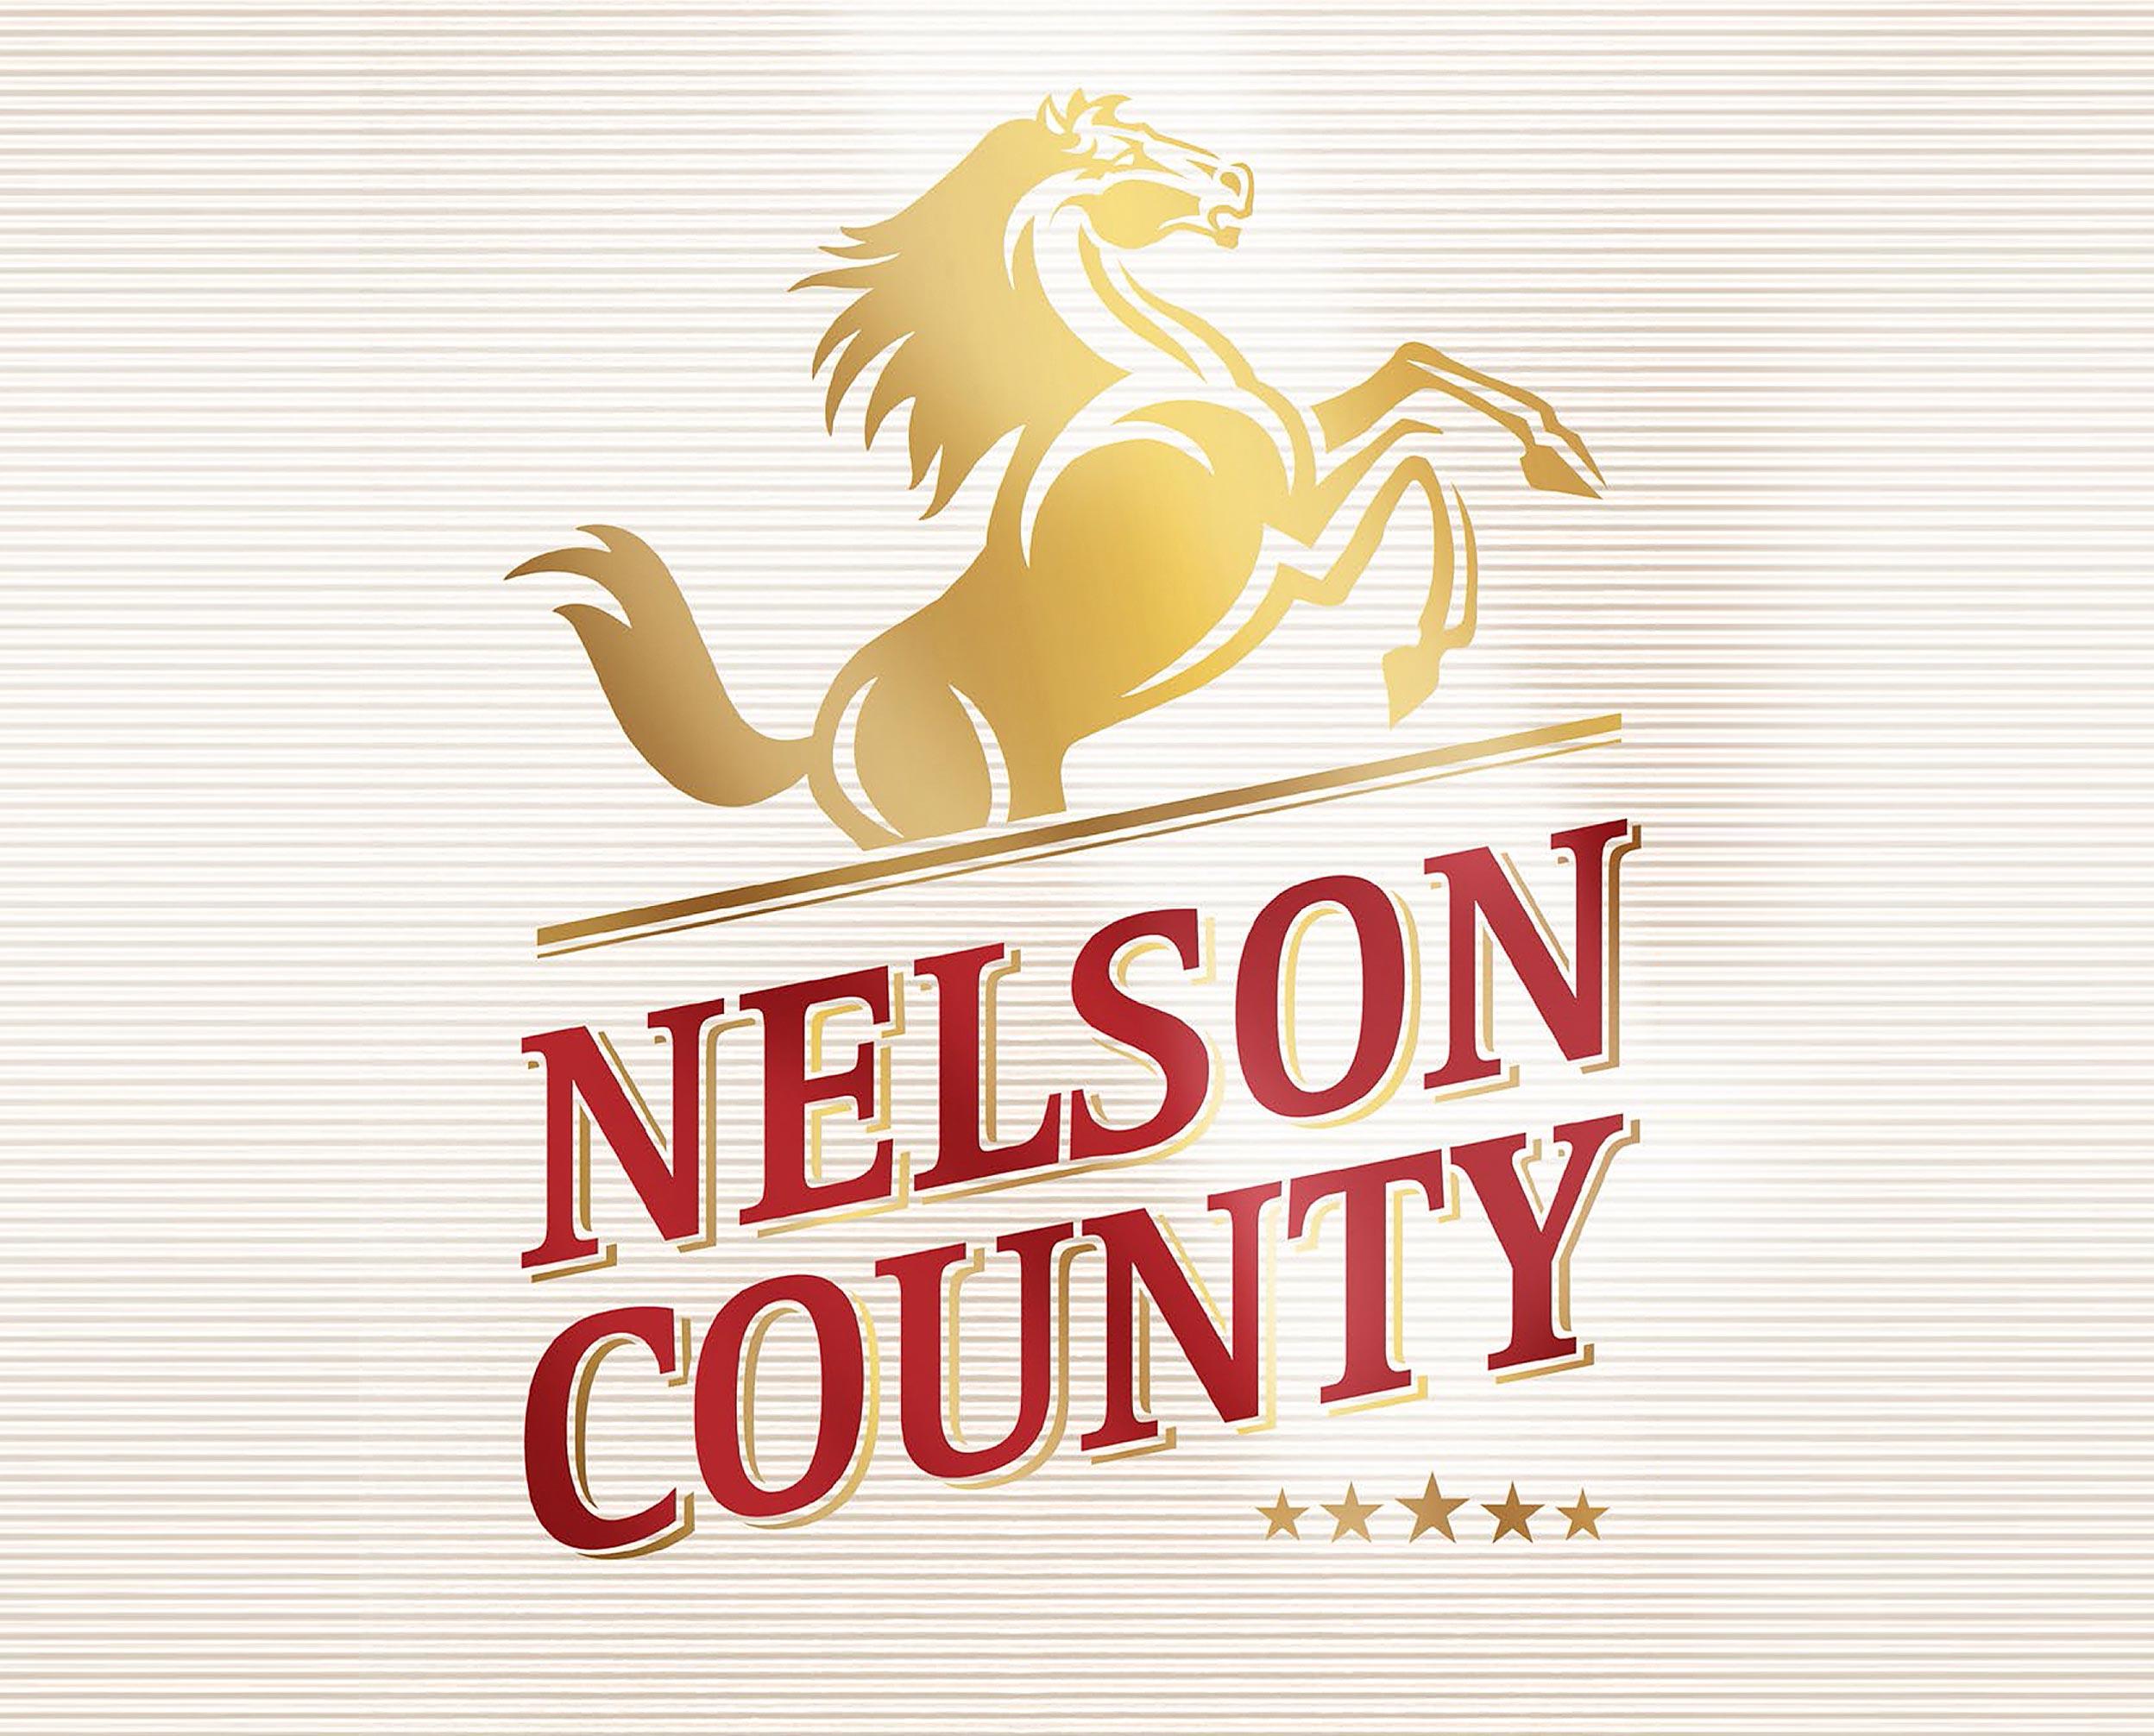 Nelson County brand refresh